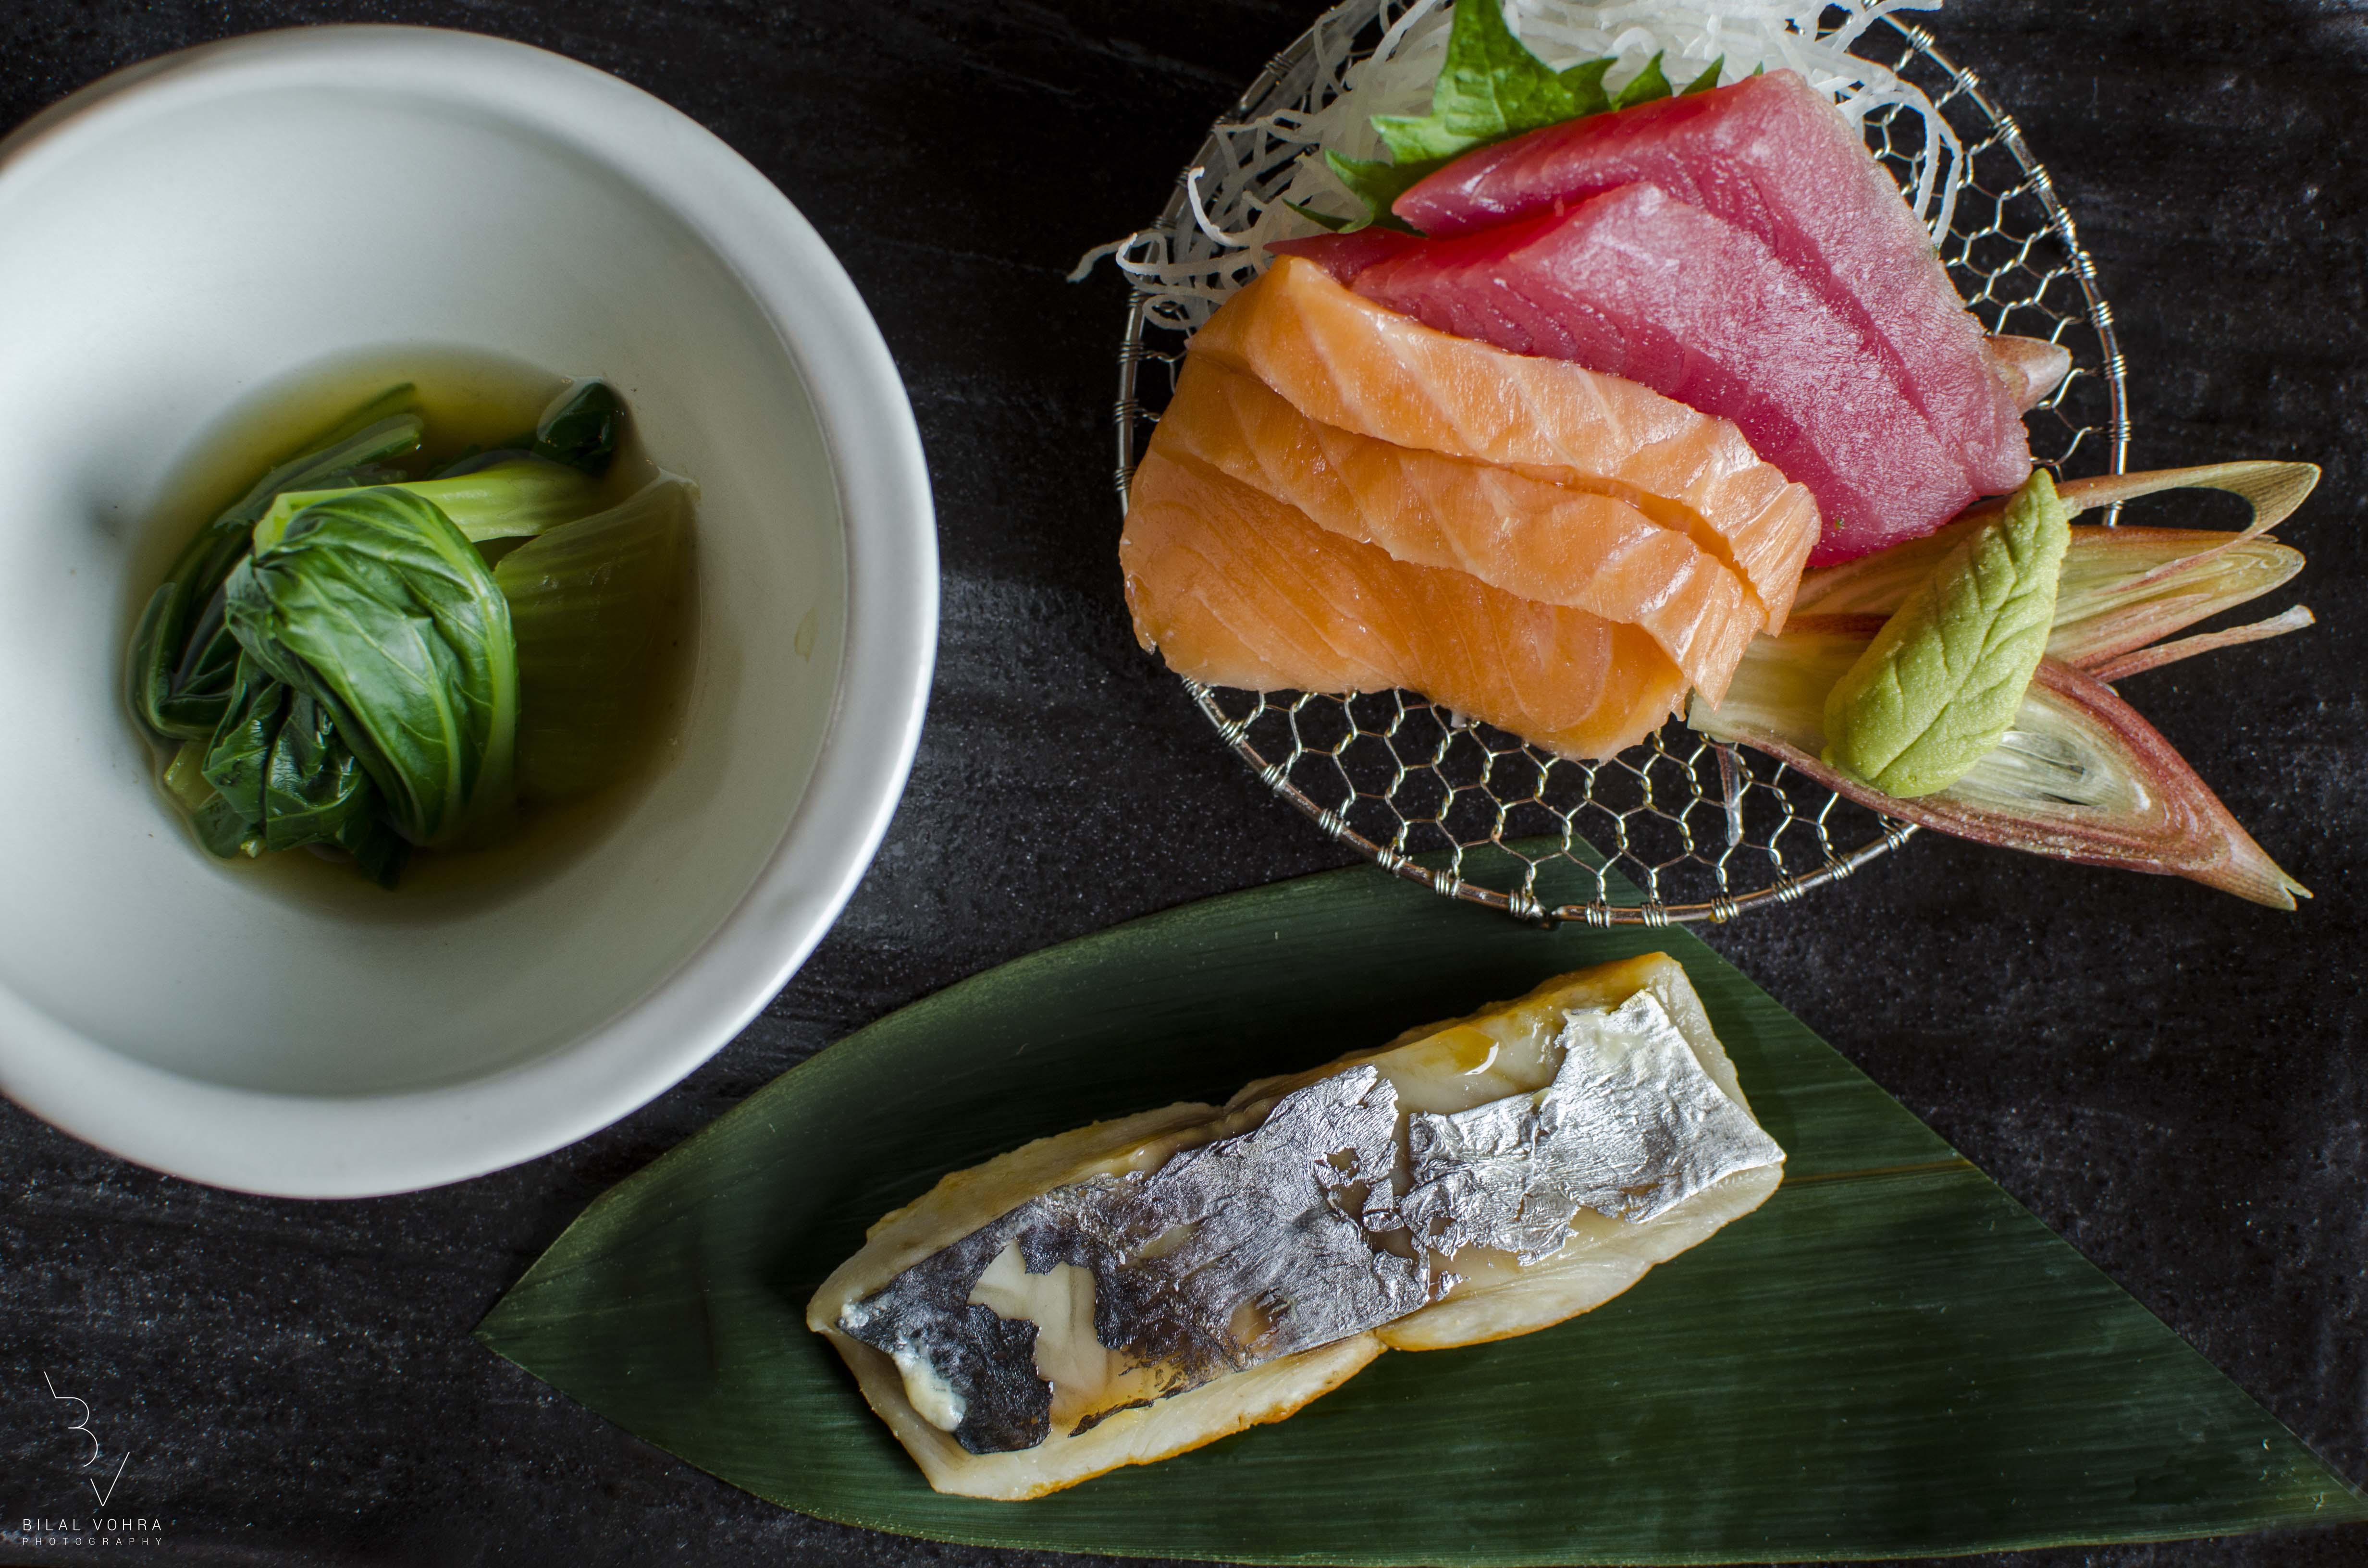 Sashimi platter - Sake (salmon), Maguro (tuna), Mackrel & Pockchoy Kobachi (Small Bowl)